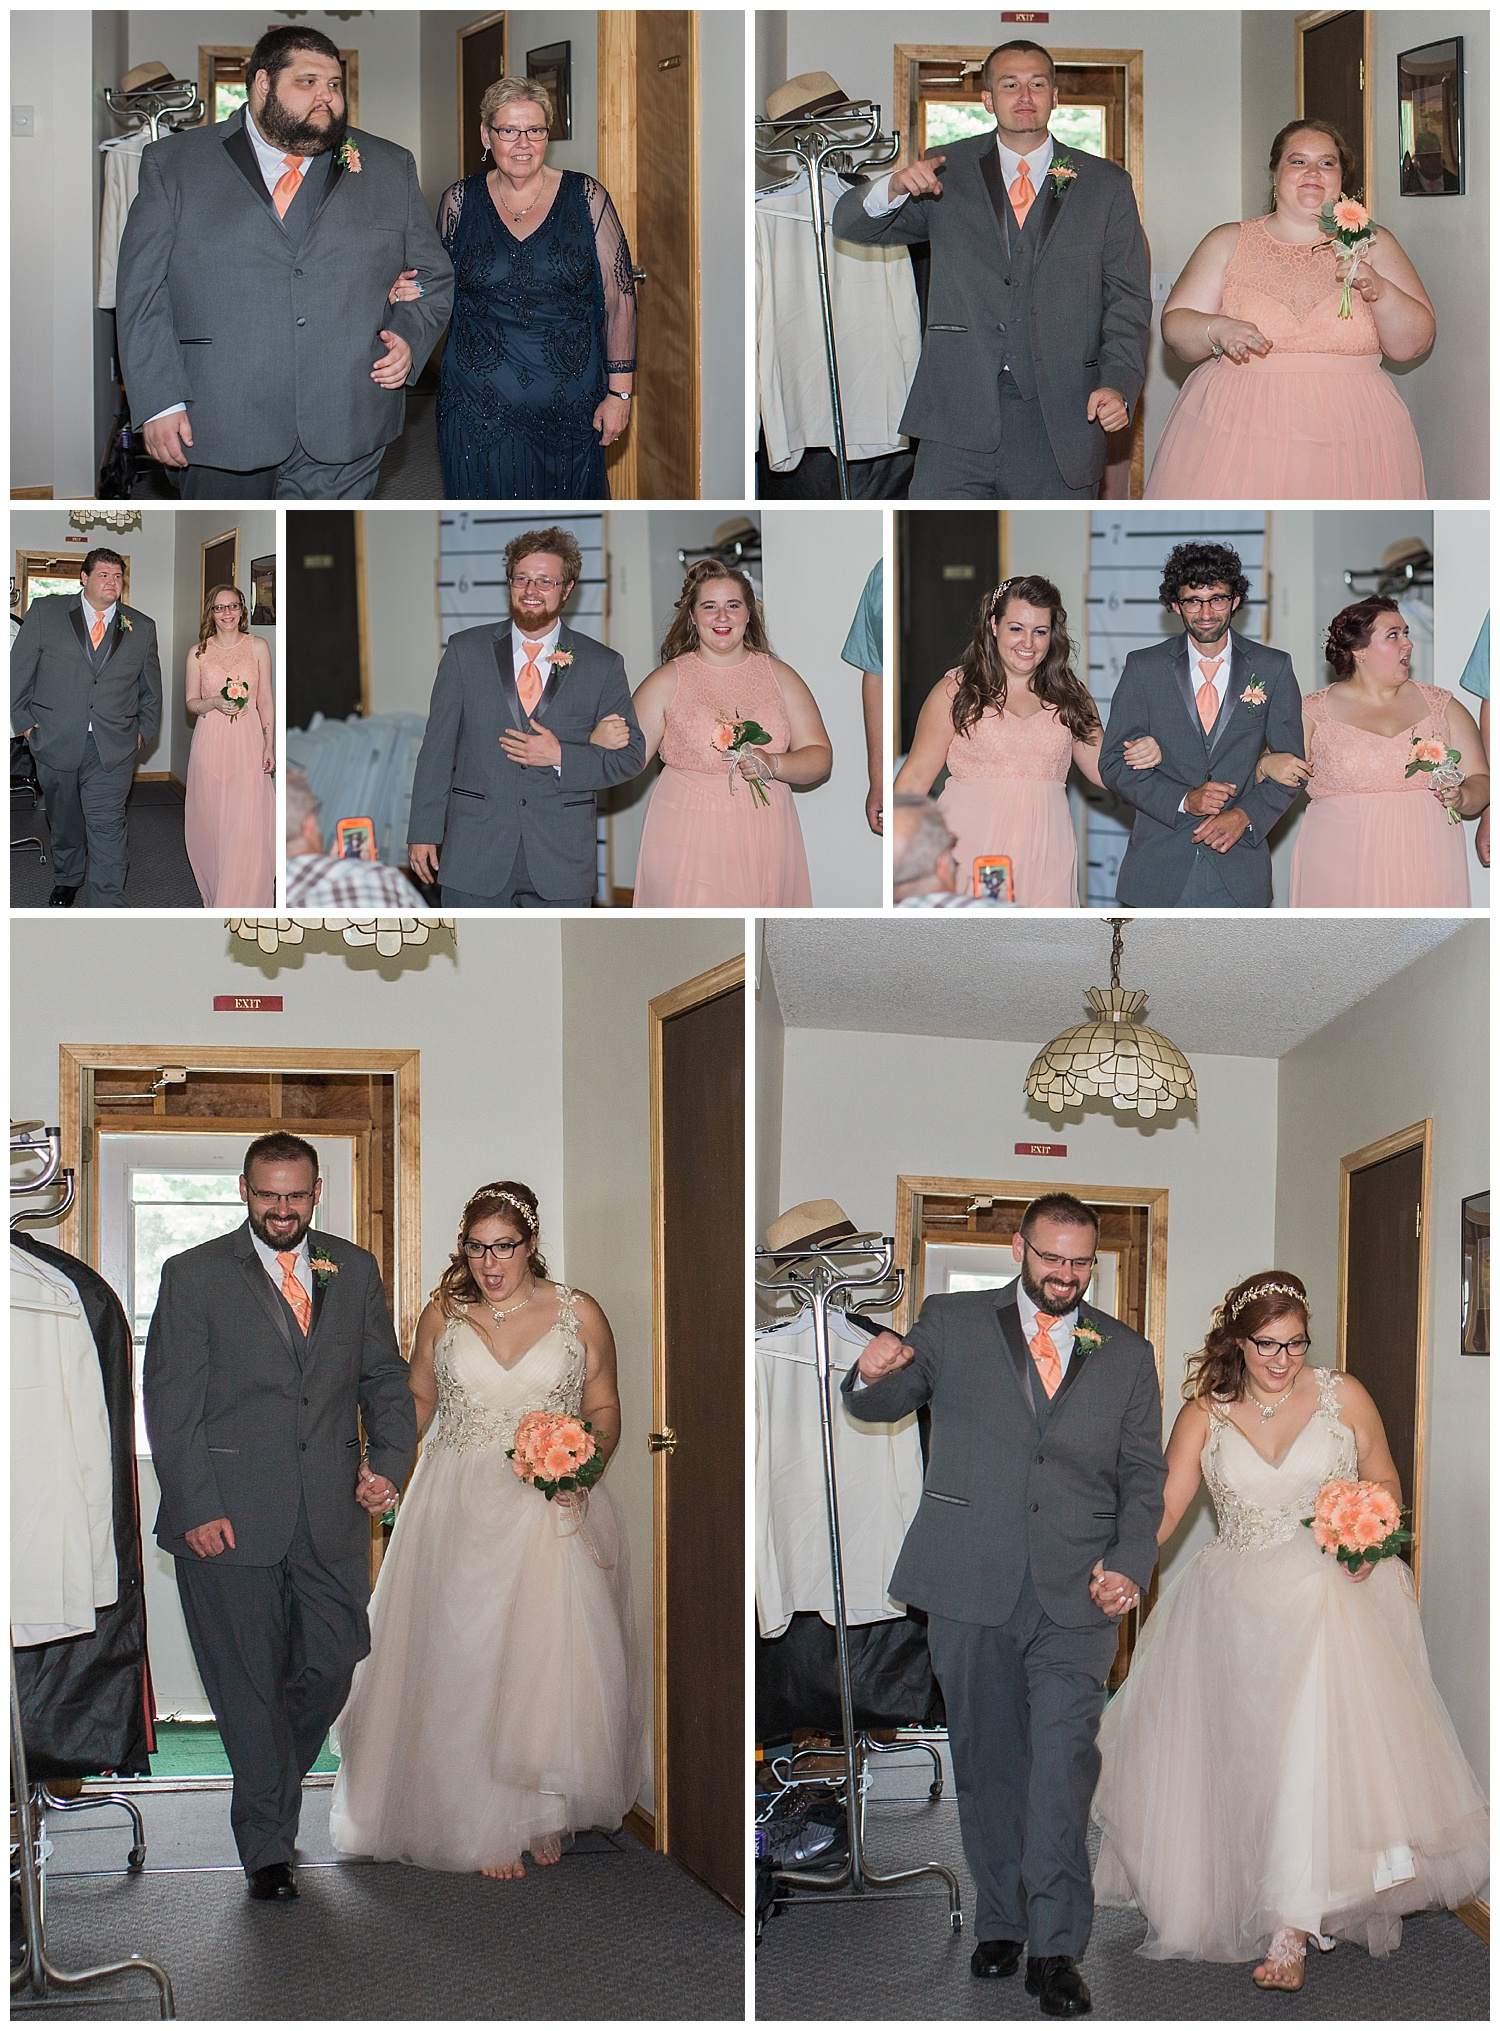 Brian and Molly Wed in Conesus NY - Lass & Beau-999_Buffalo wedding photography.jpg